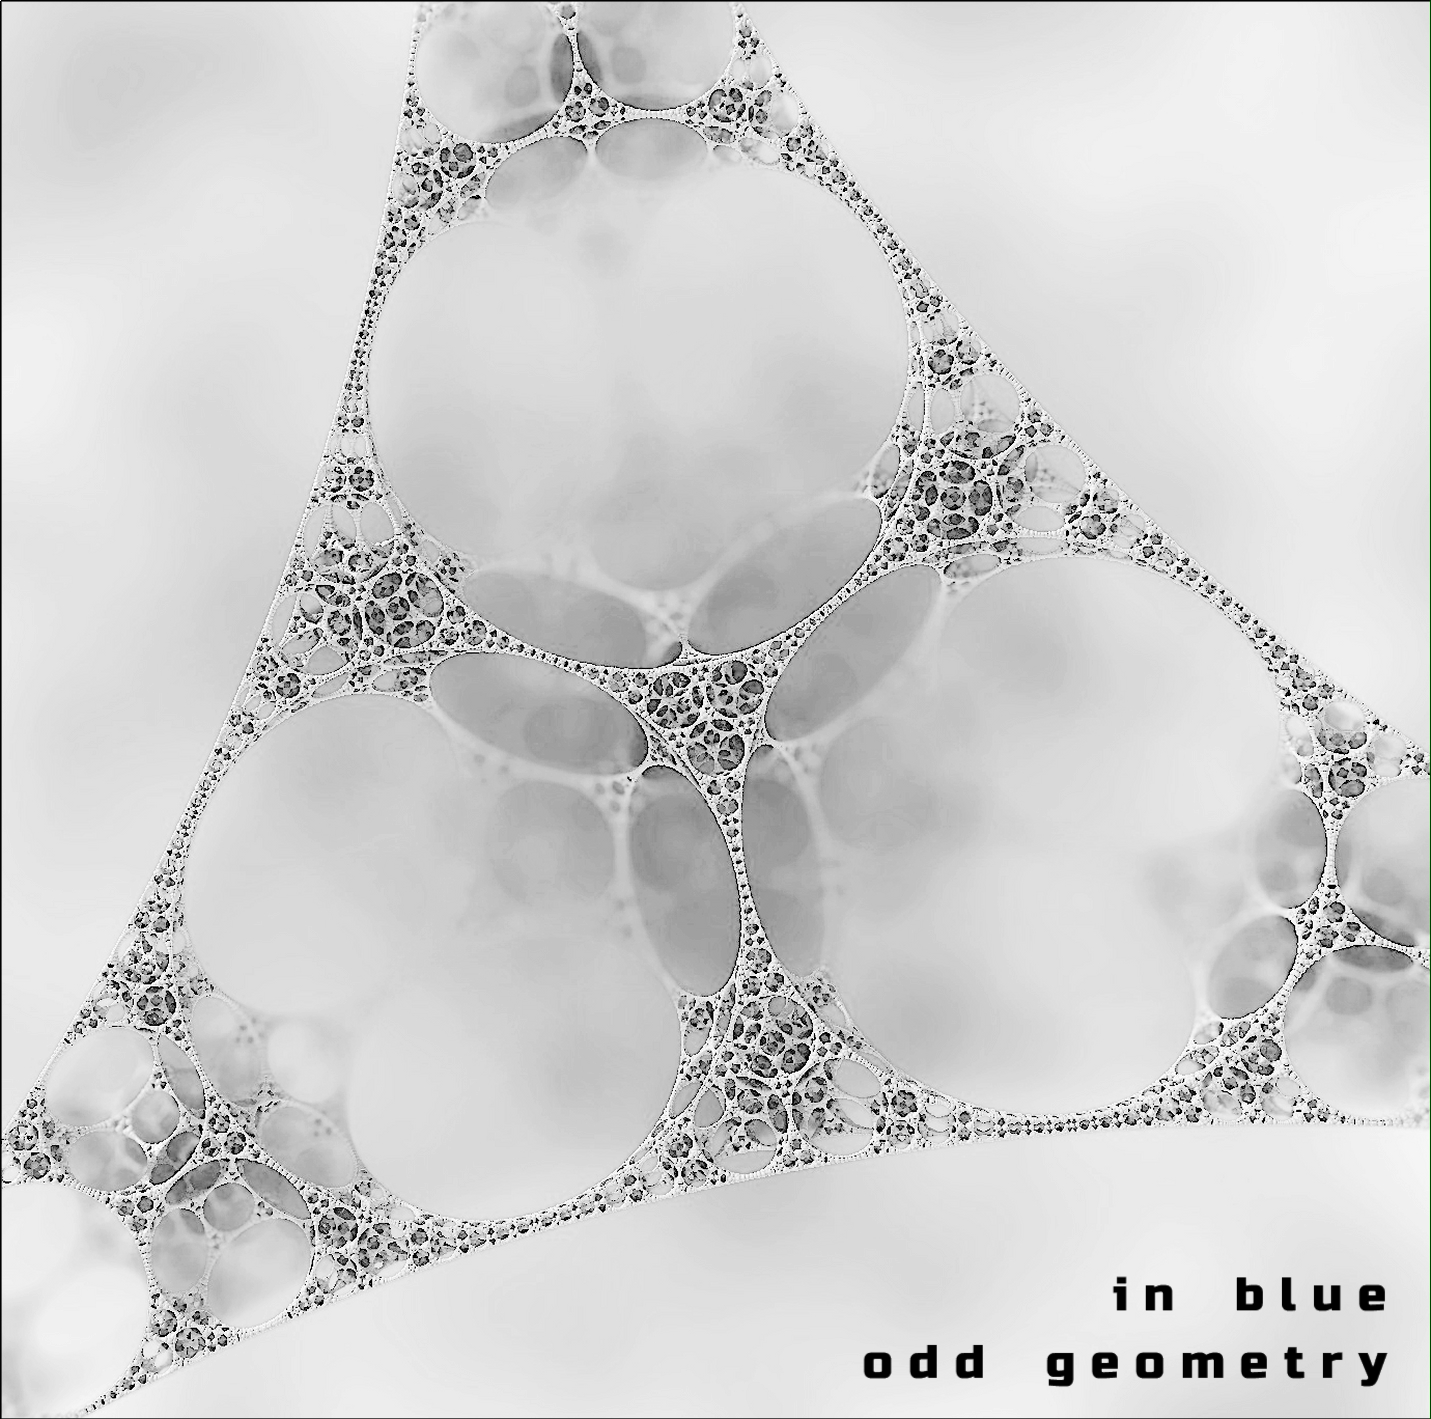 Odd Geometry (Single)